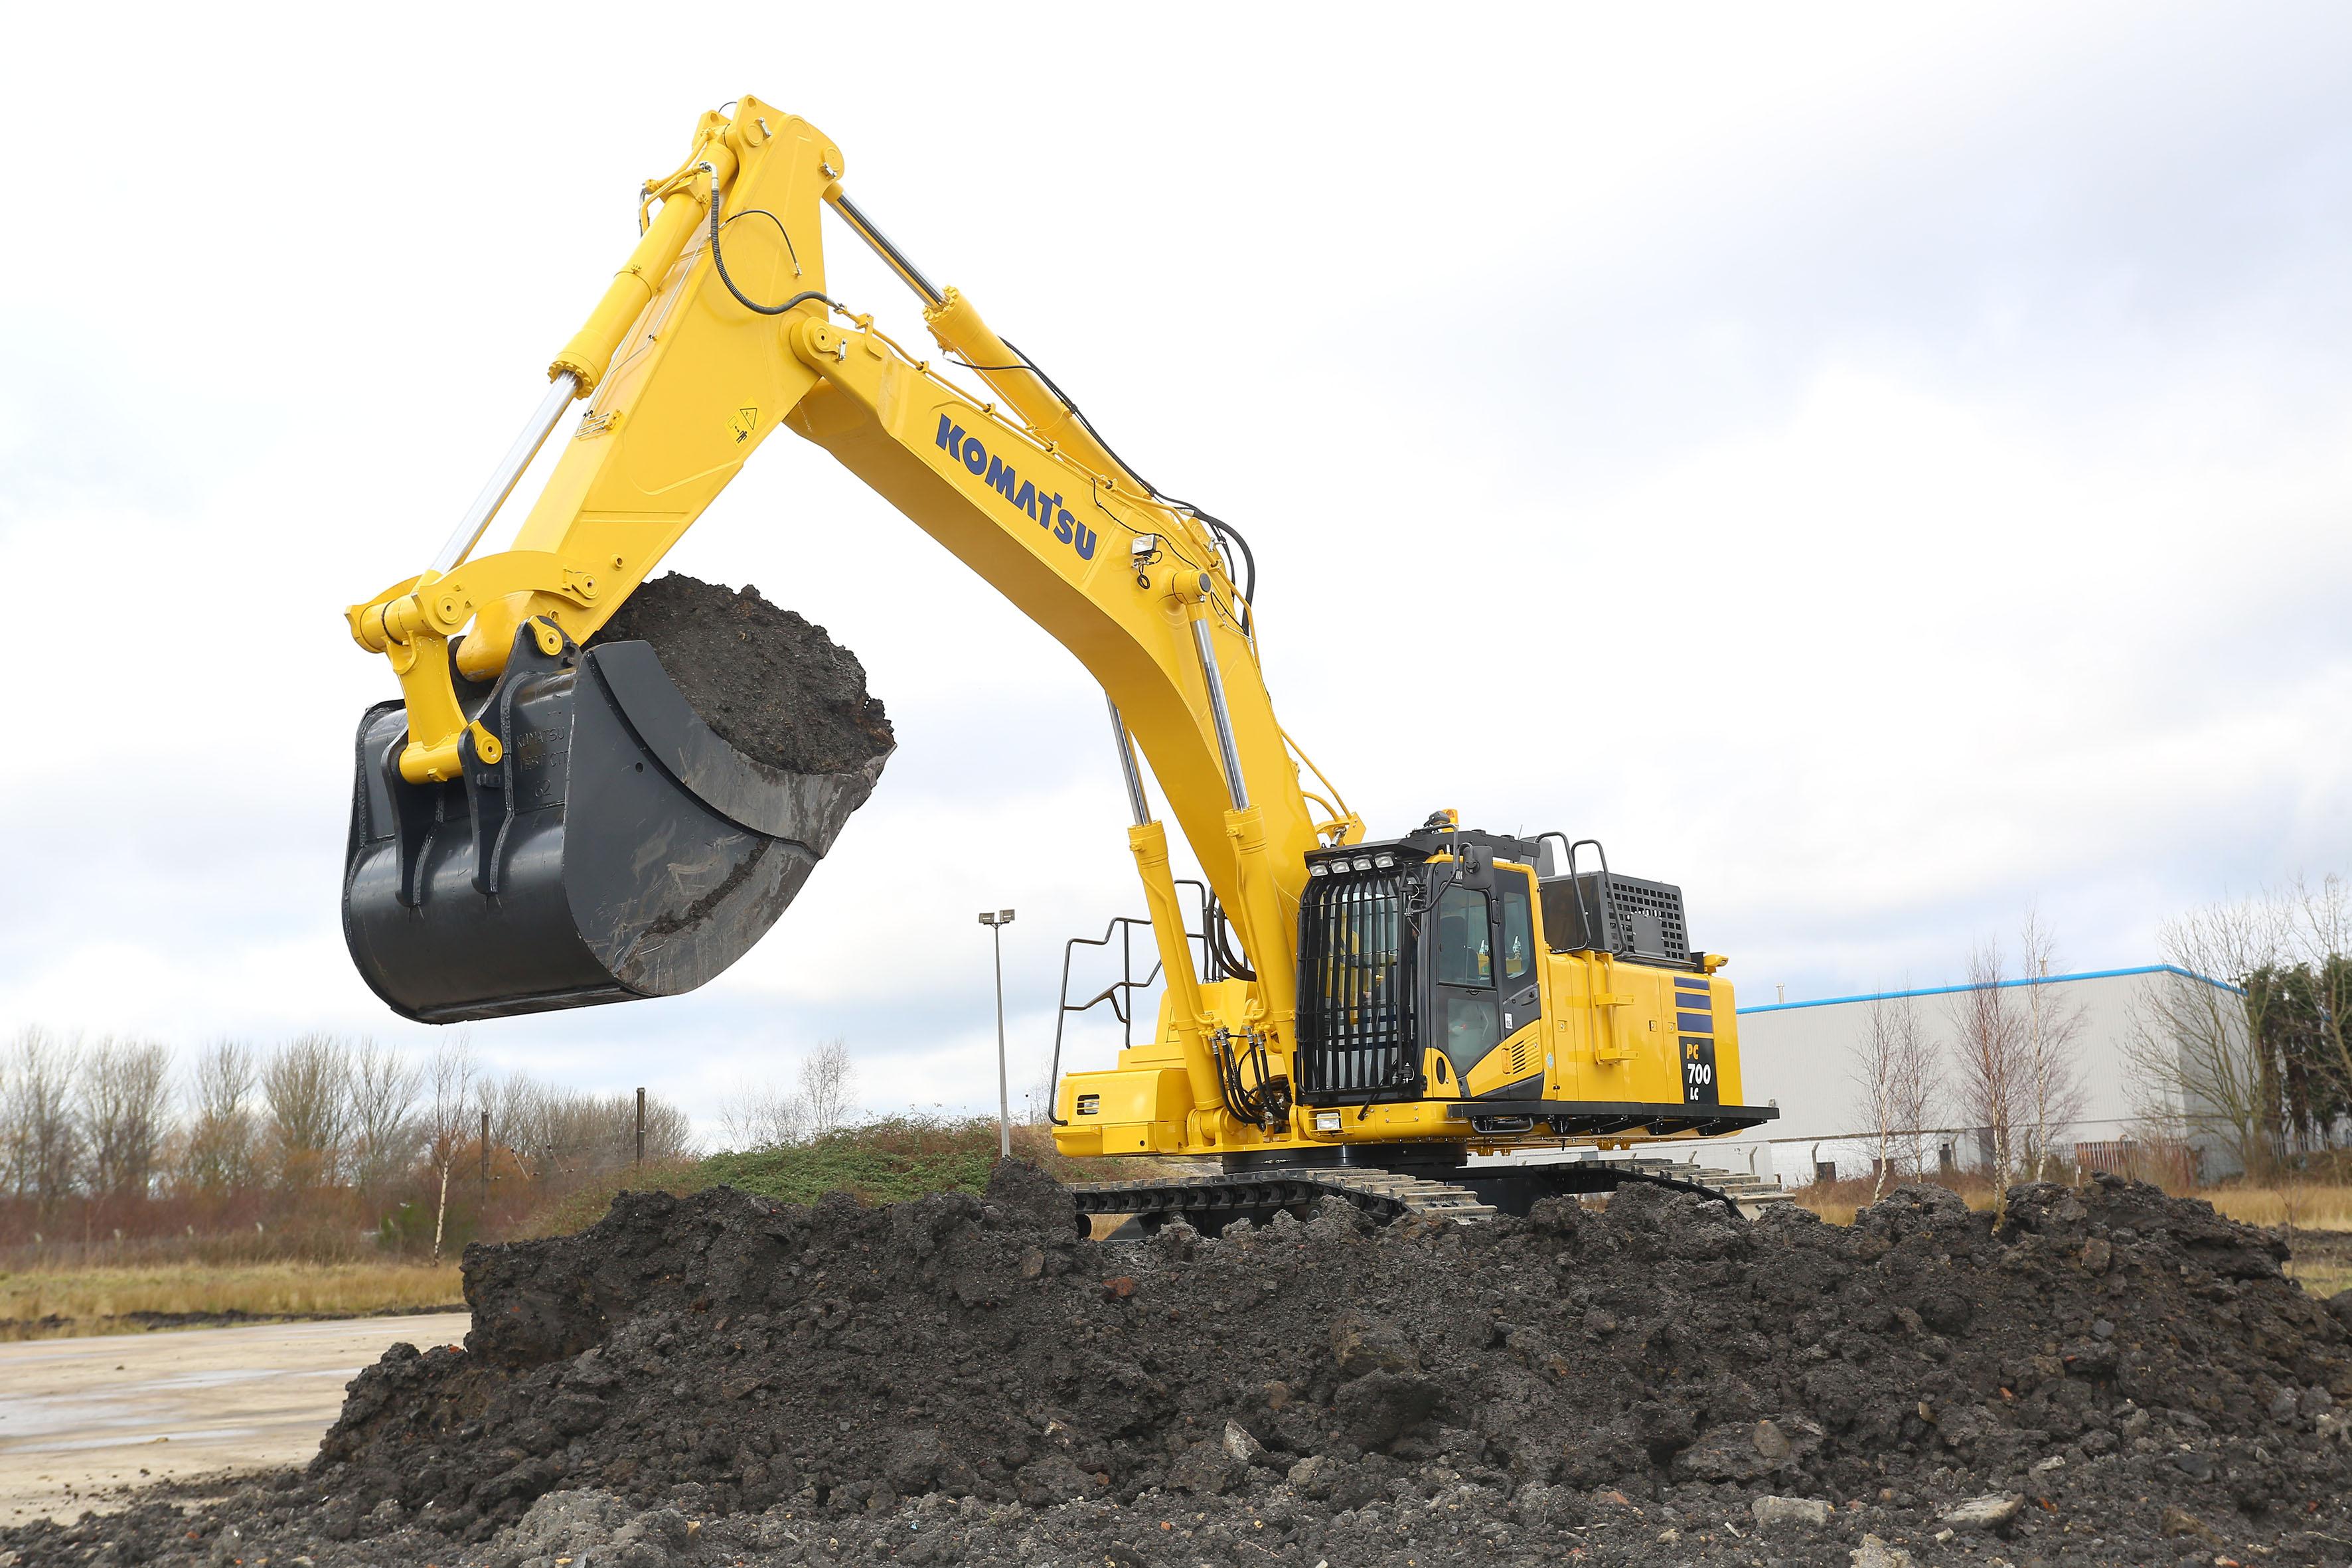 Komatsu PC700LC‐11 hydraulic excavator